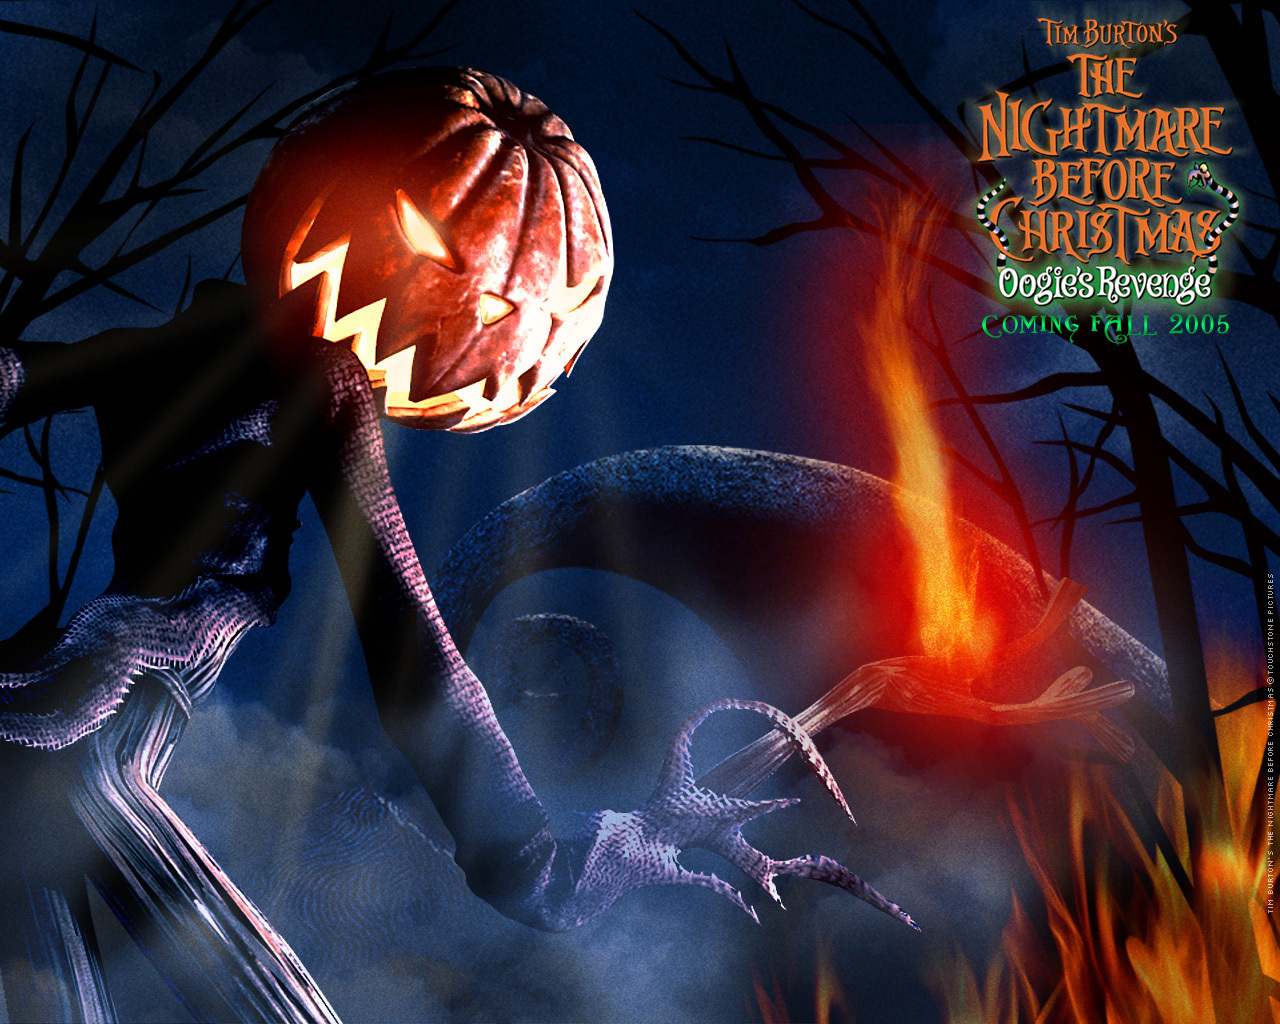 Pumpkin King | The Nightmare Before Christmas Wiki | FANDOM powered ...